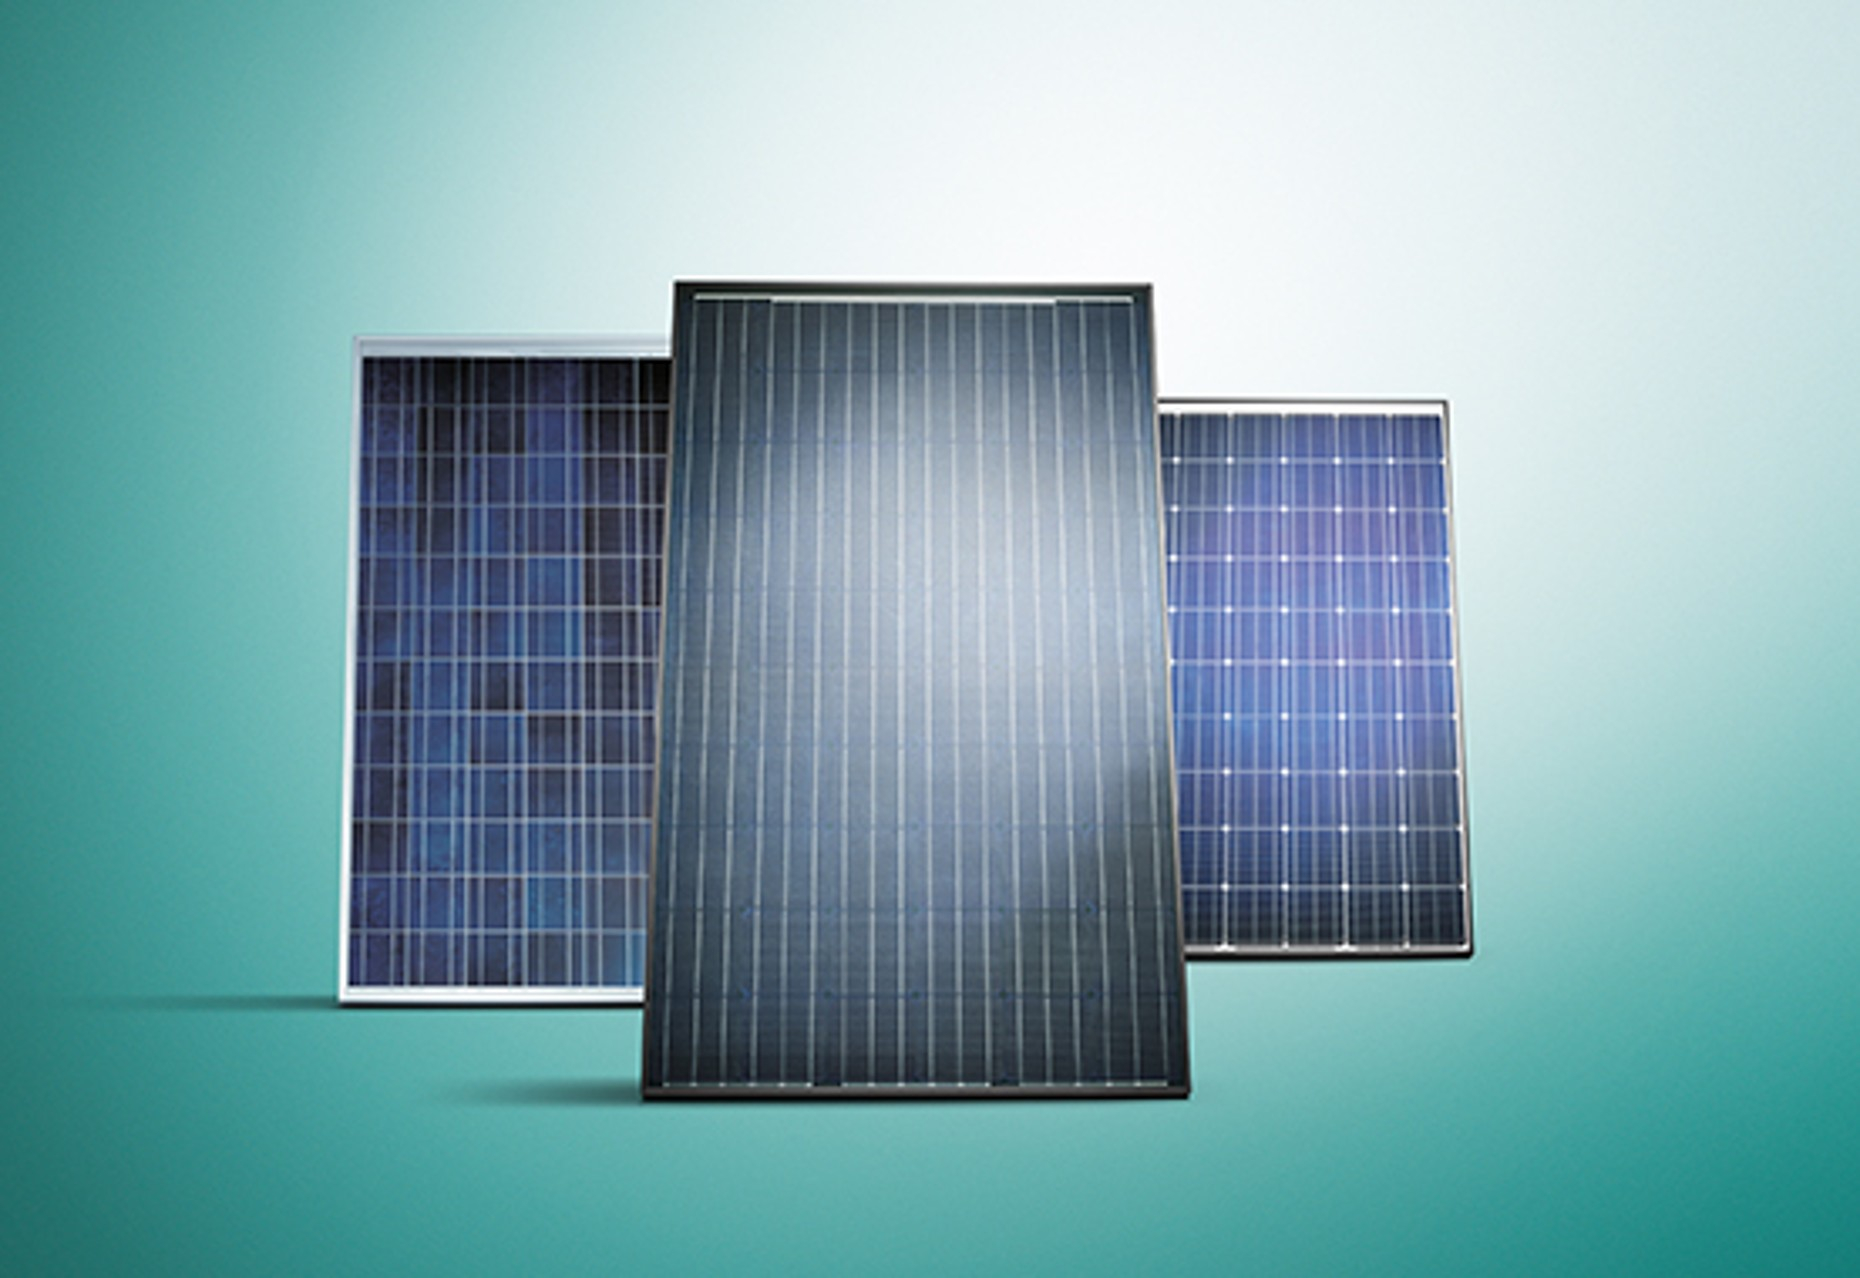 Vaillant zonne energie | Van CleynenBreugel Bart bv